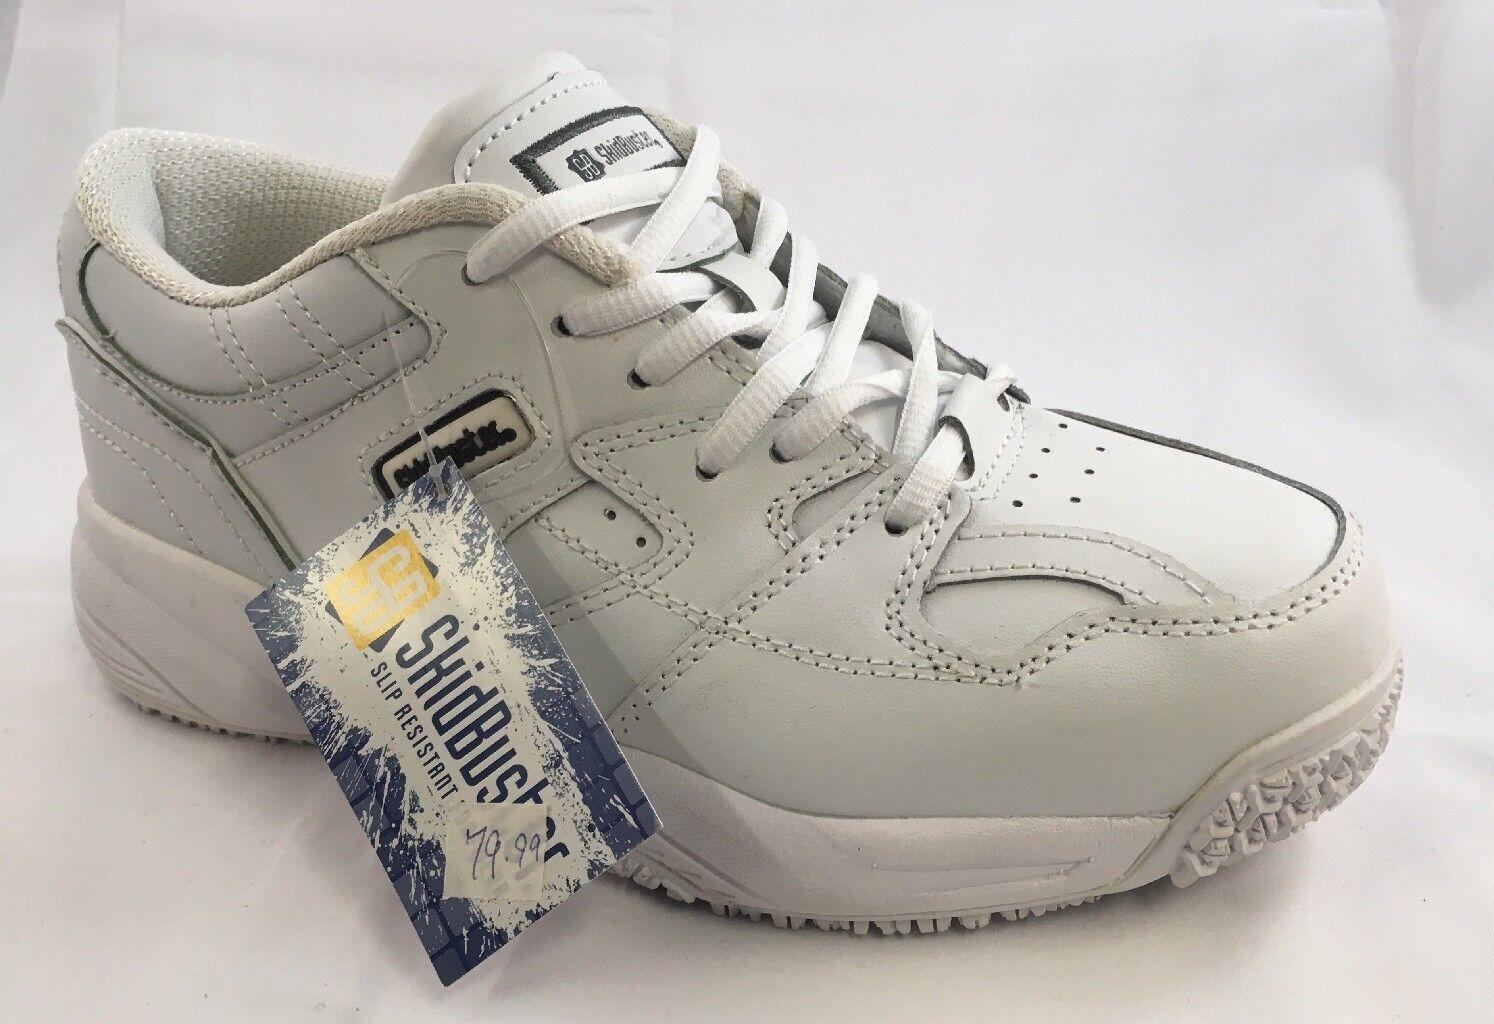 Skidbuster Slip Resistant Resistant Resistant damen schuhe  S5056 ff8816